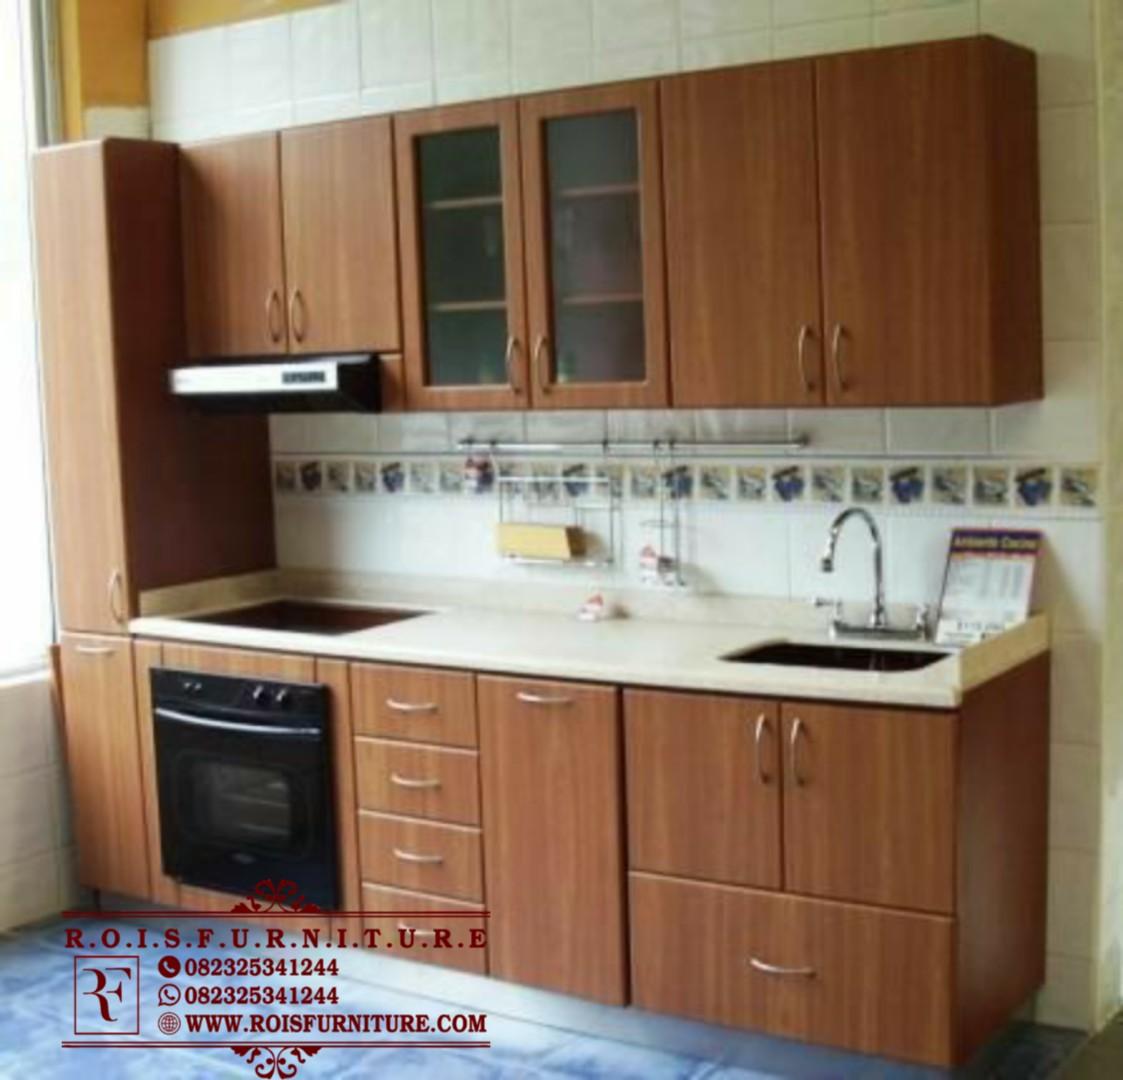 Set Lemari Dapur Minimalis Terbaru Rois Furniture Jepara